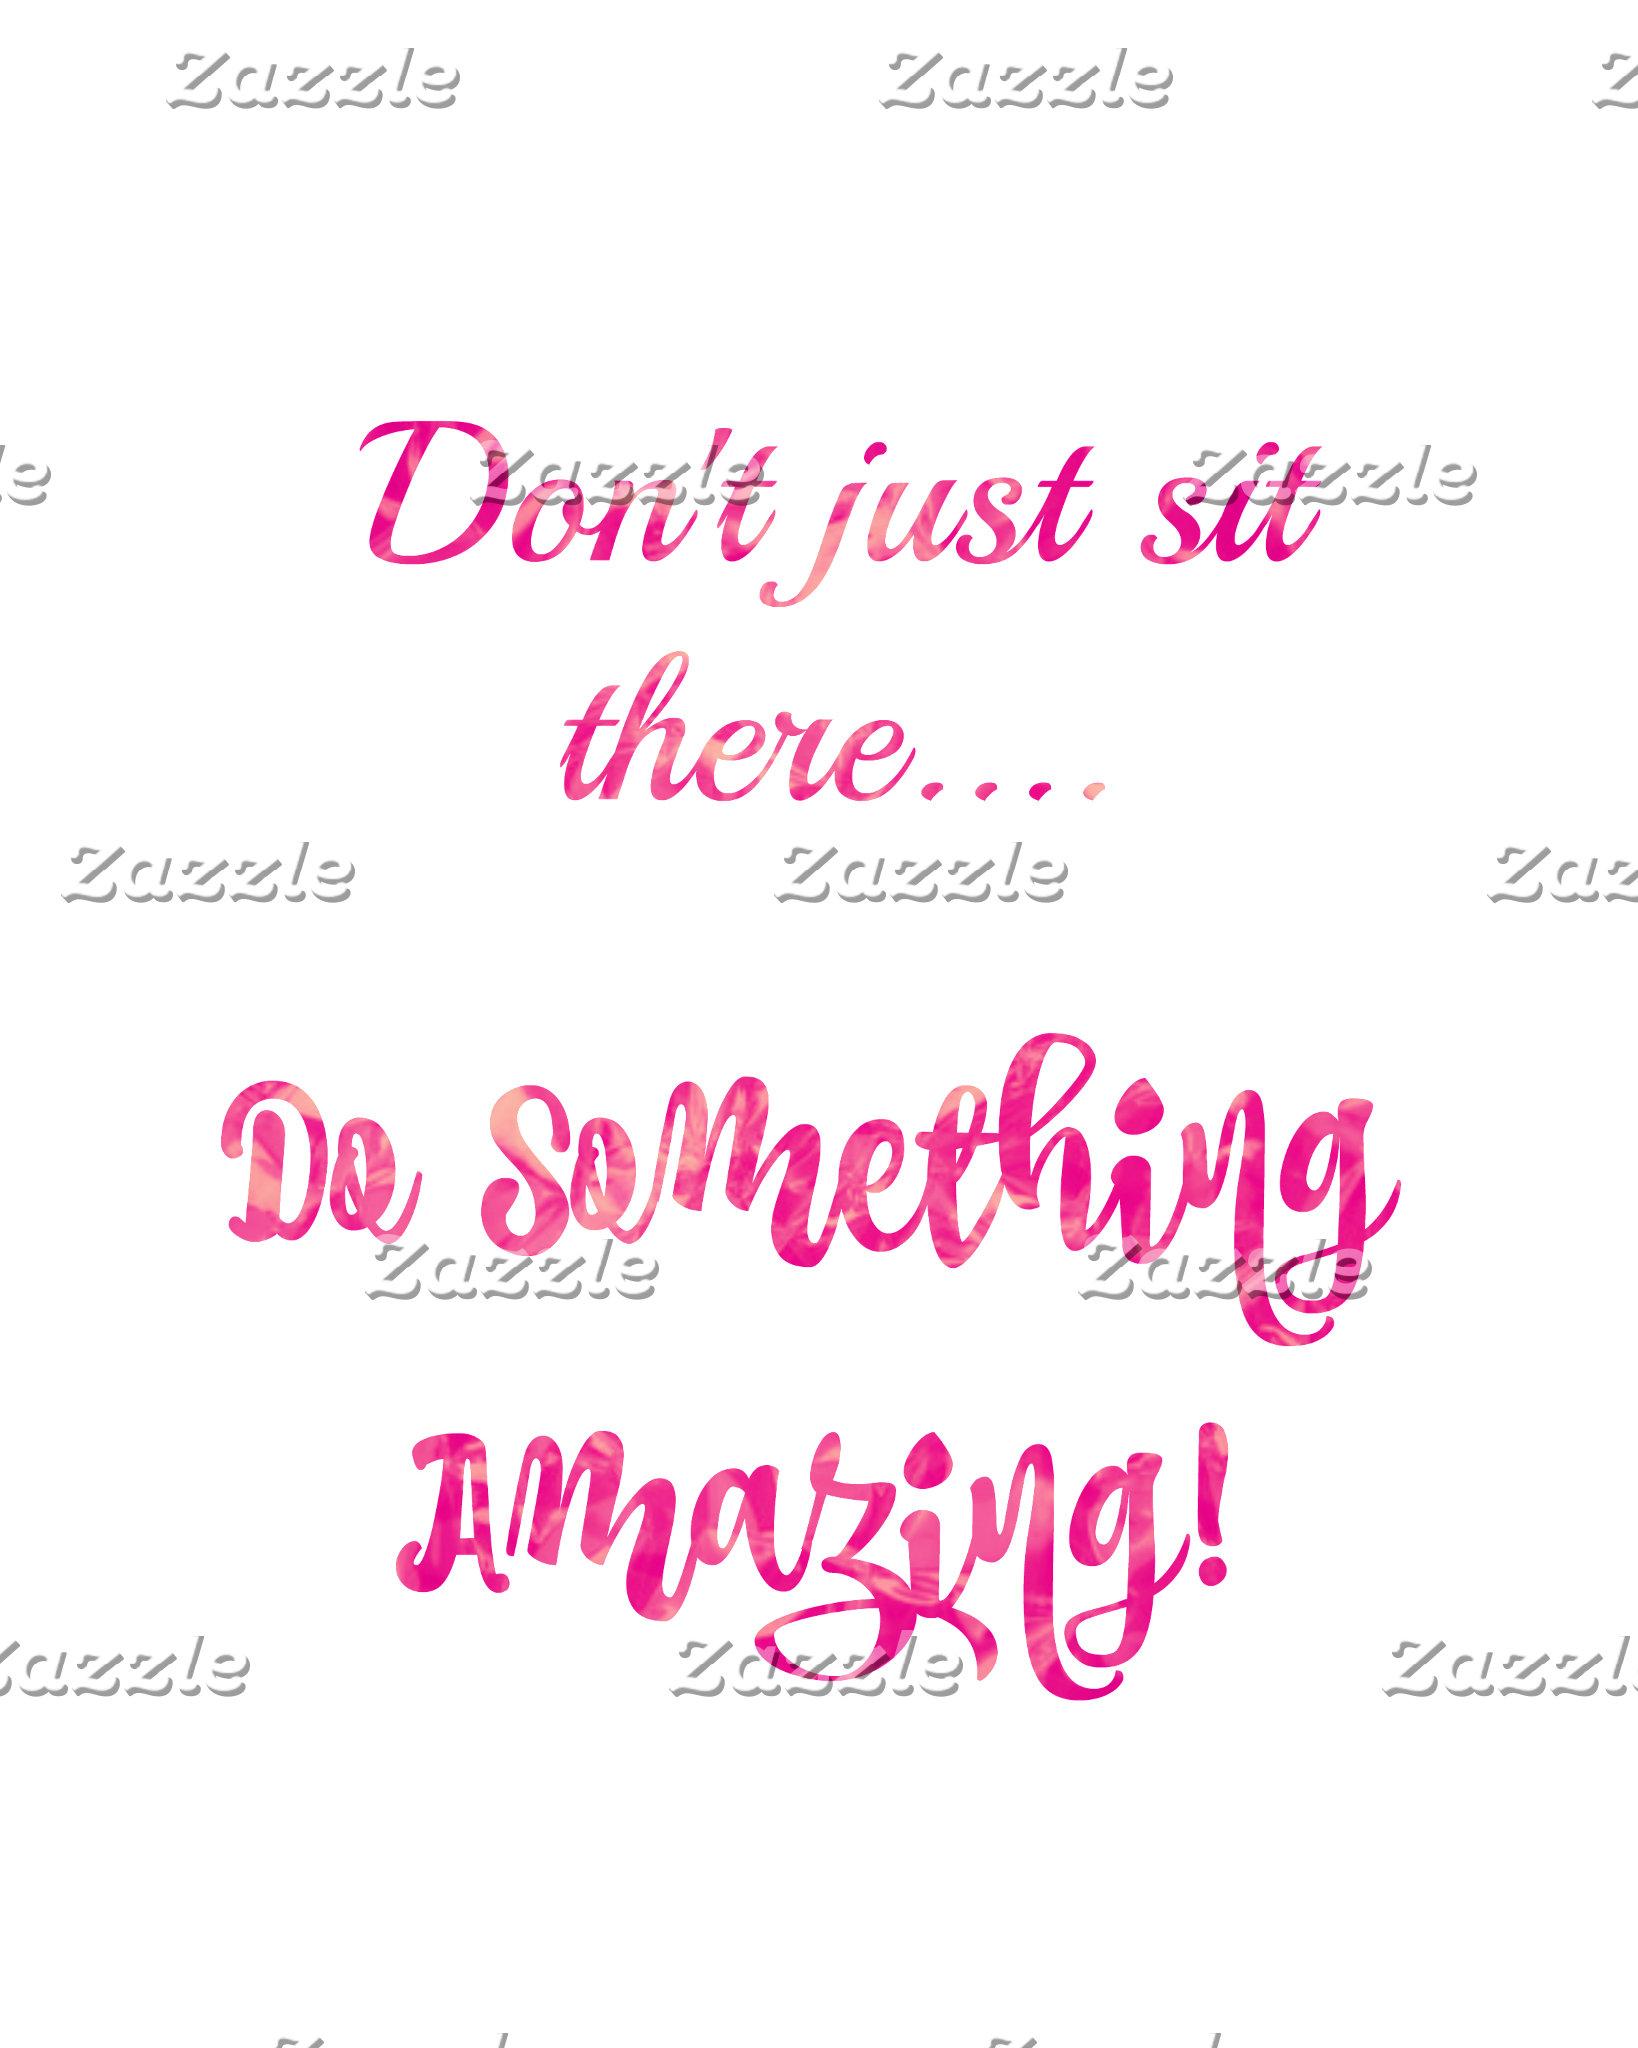 Motivational Office Prints